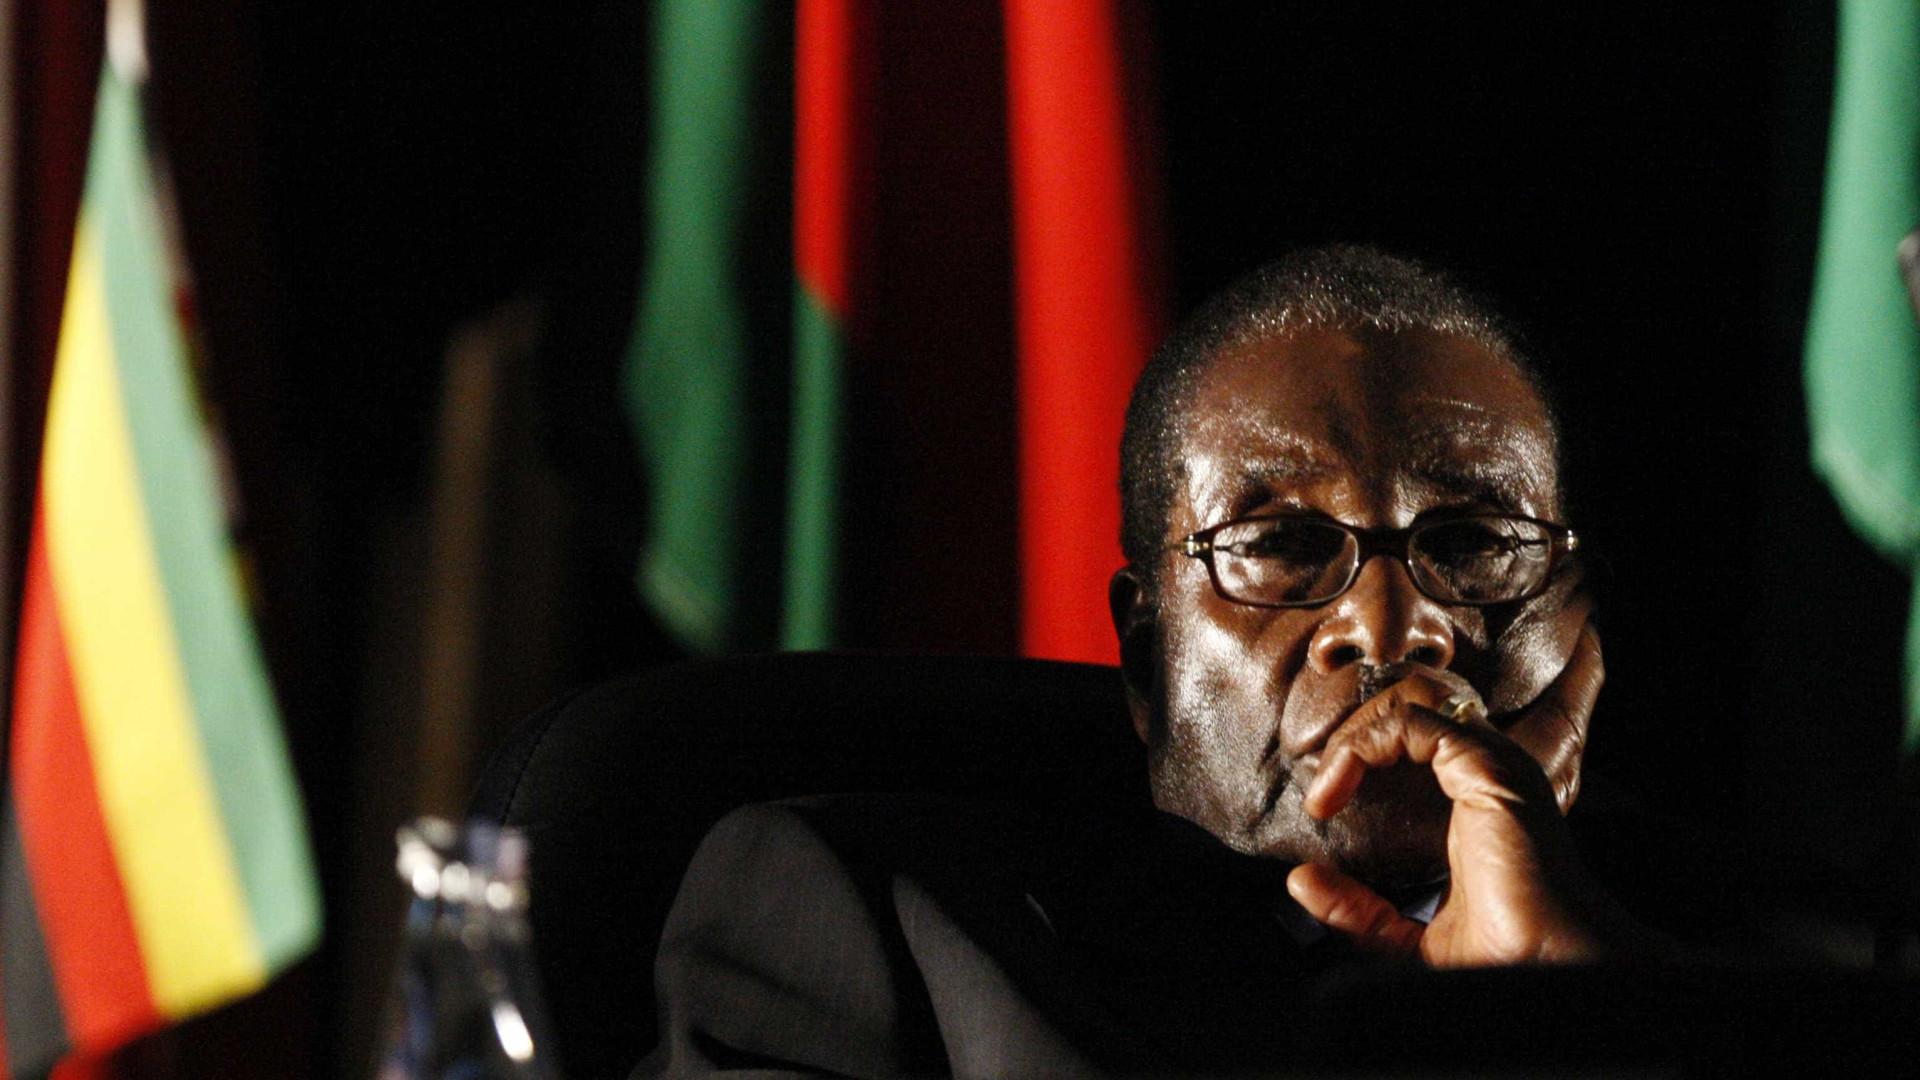 Ex-vice, Mnangagwa toma posse como presidente do Zimbábue amanhã